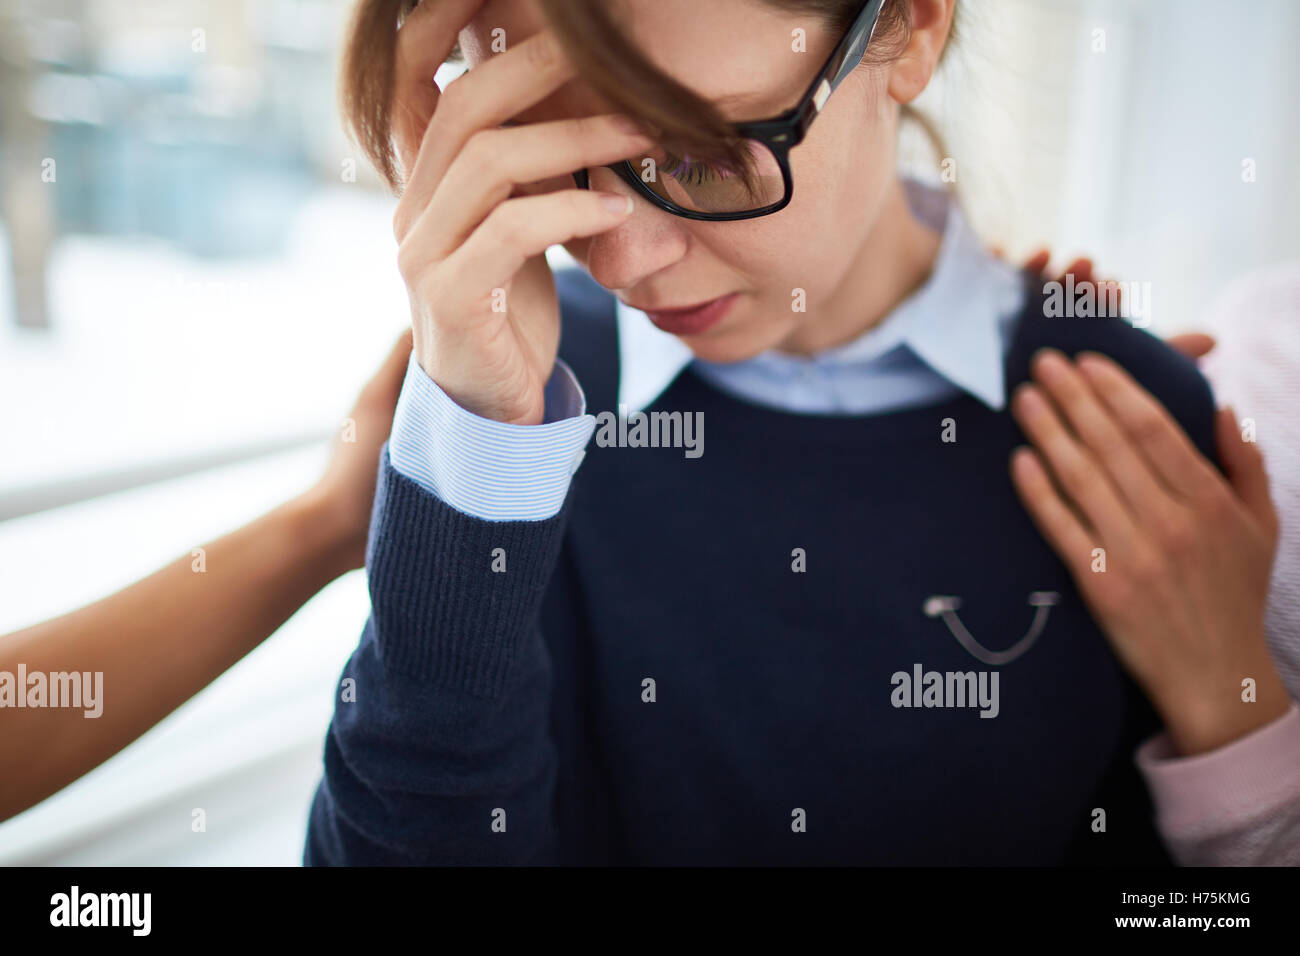 Despair - Stock Image